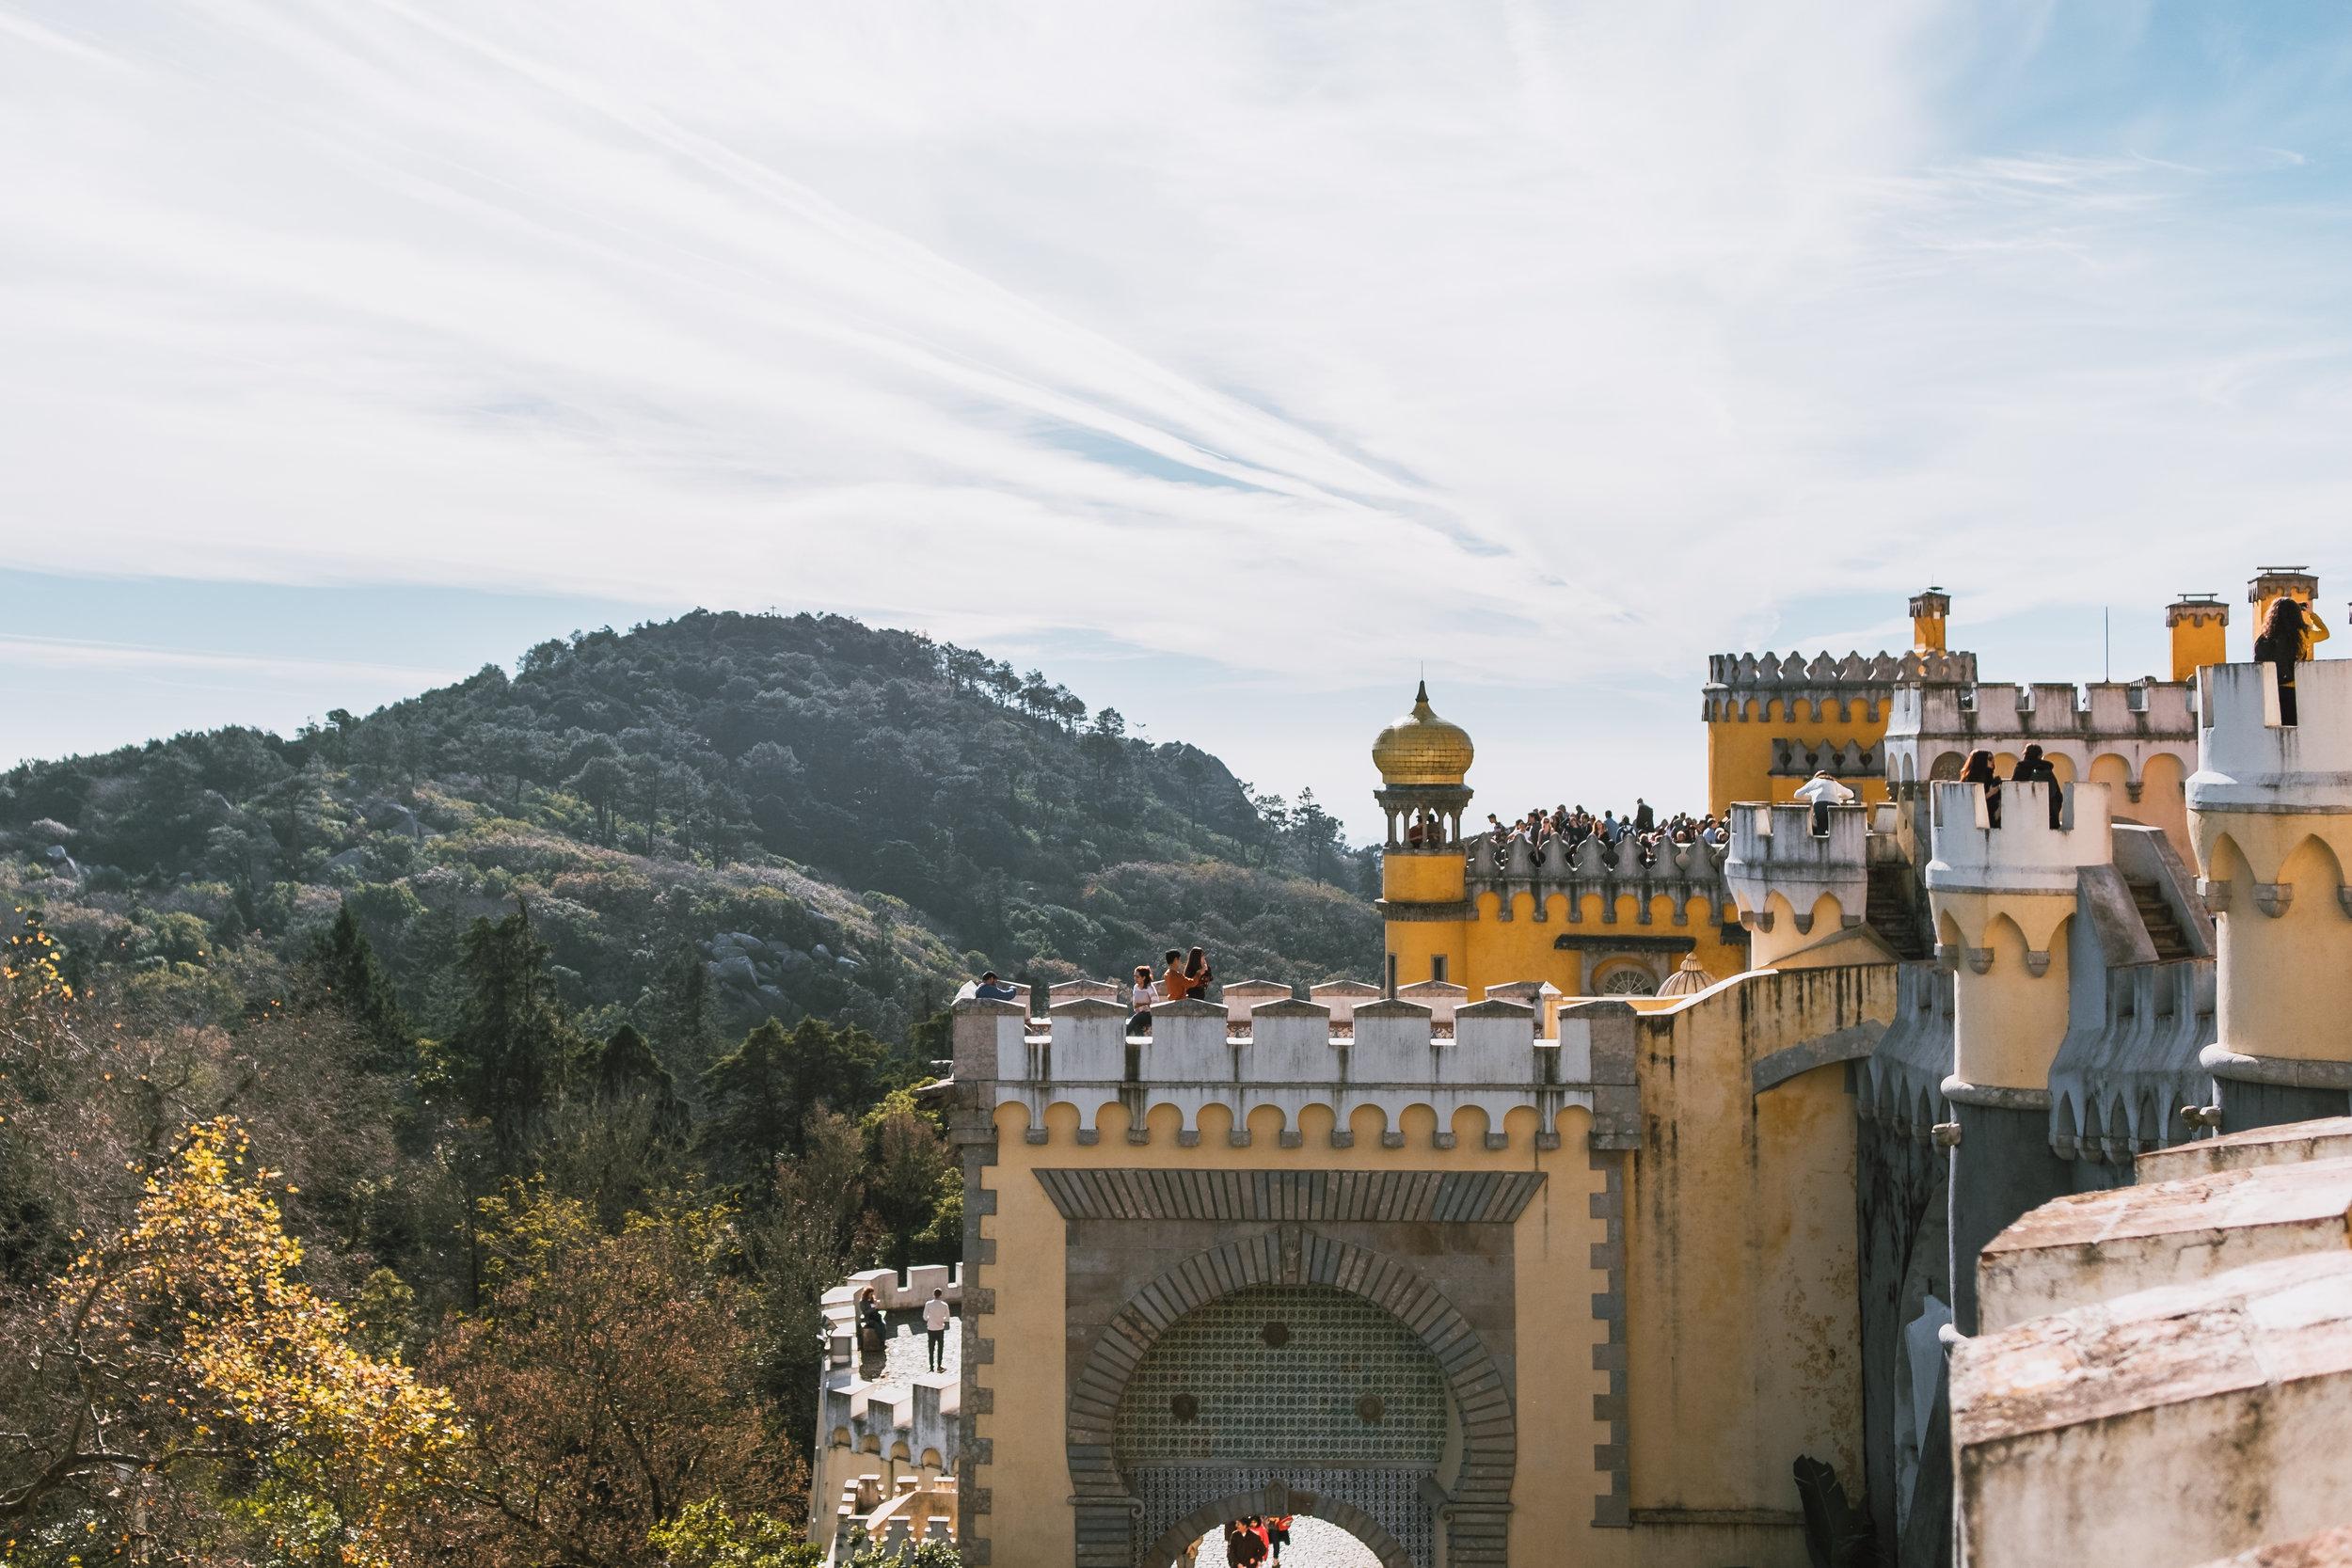 sintra+pena palace+portugal